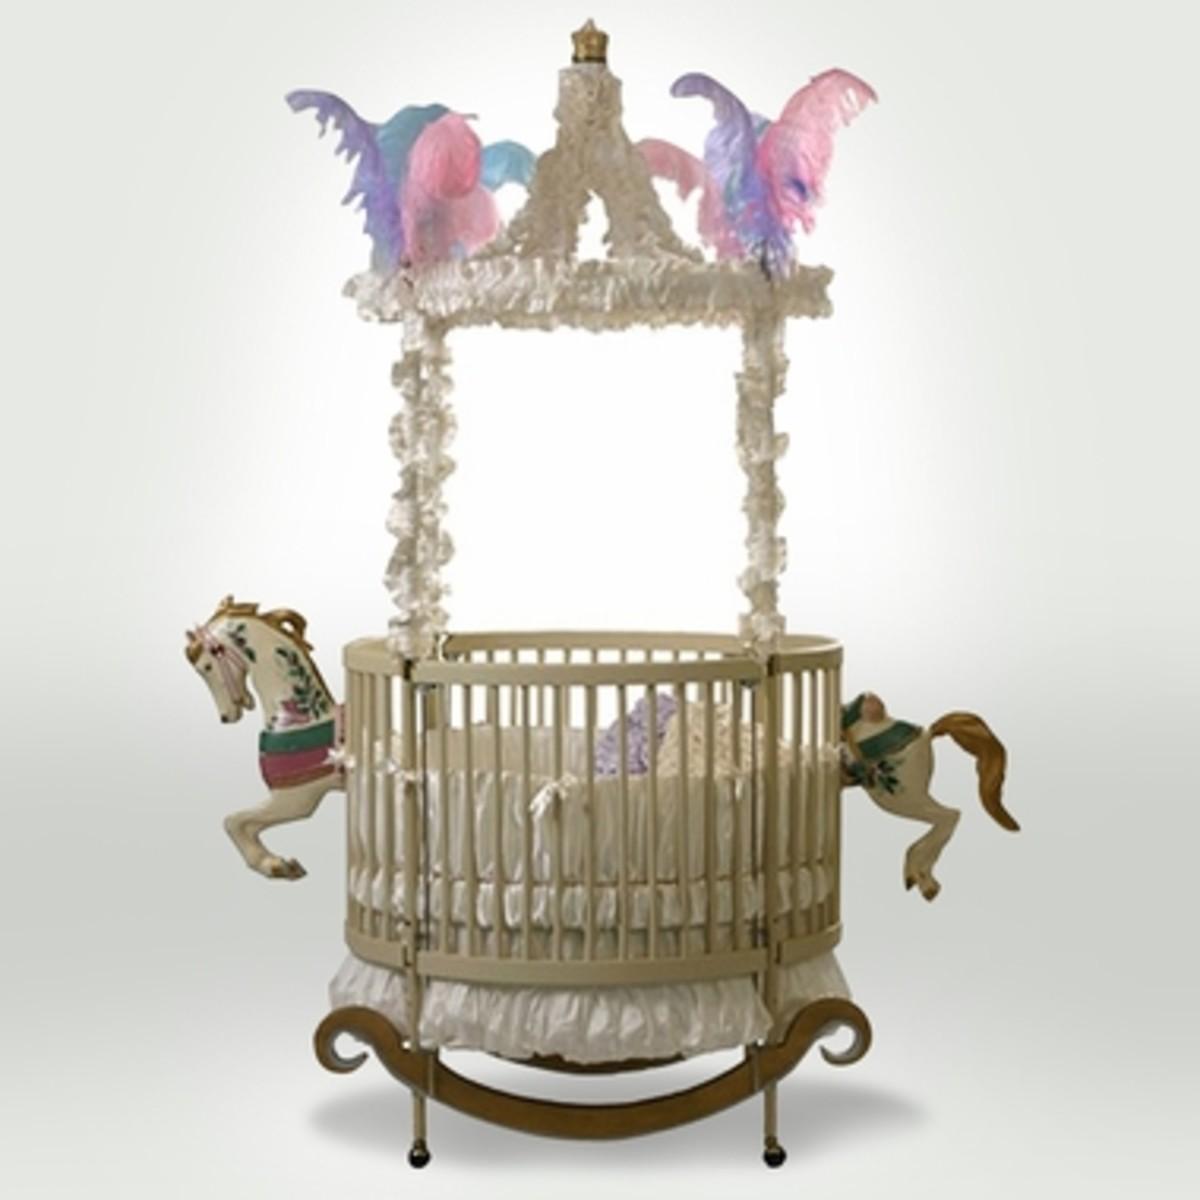 The Round Carousel Horse Crib